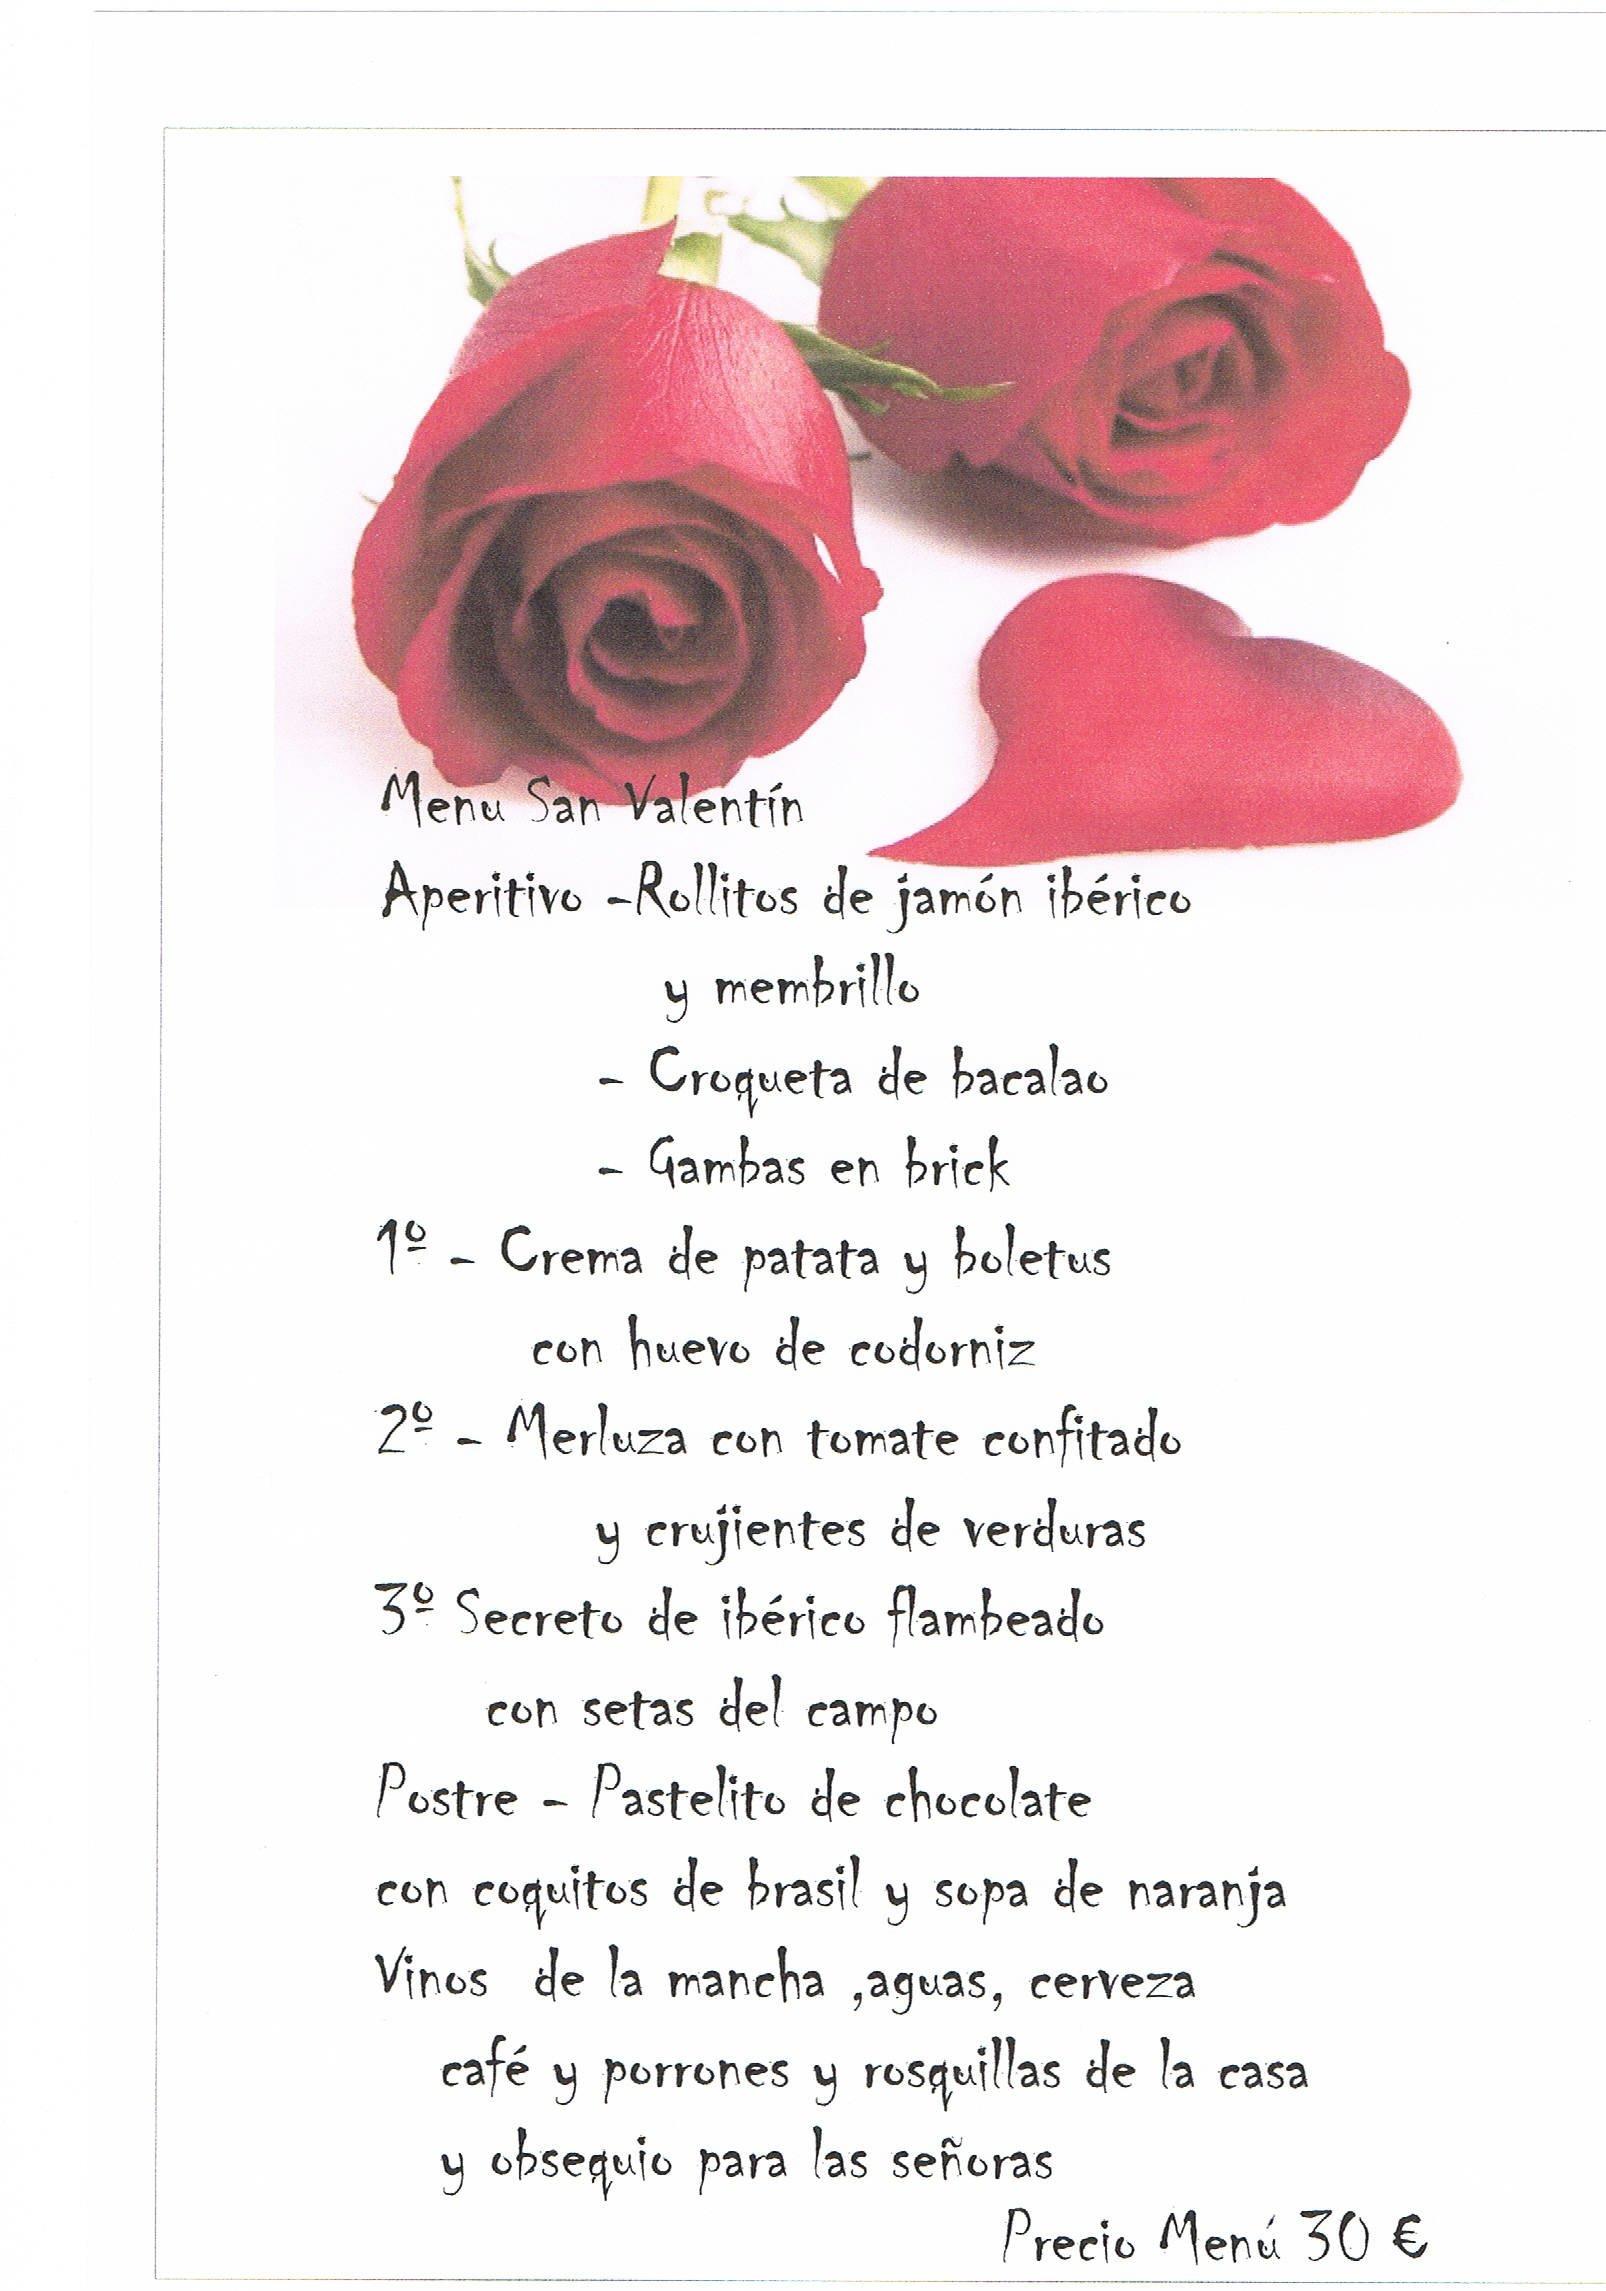 Menú San Valentín 2014